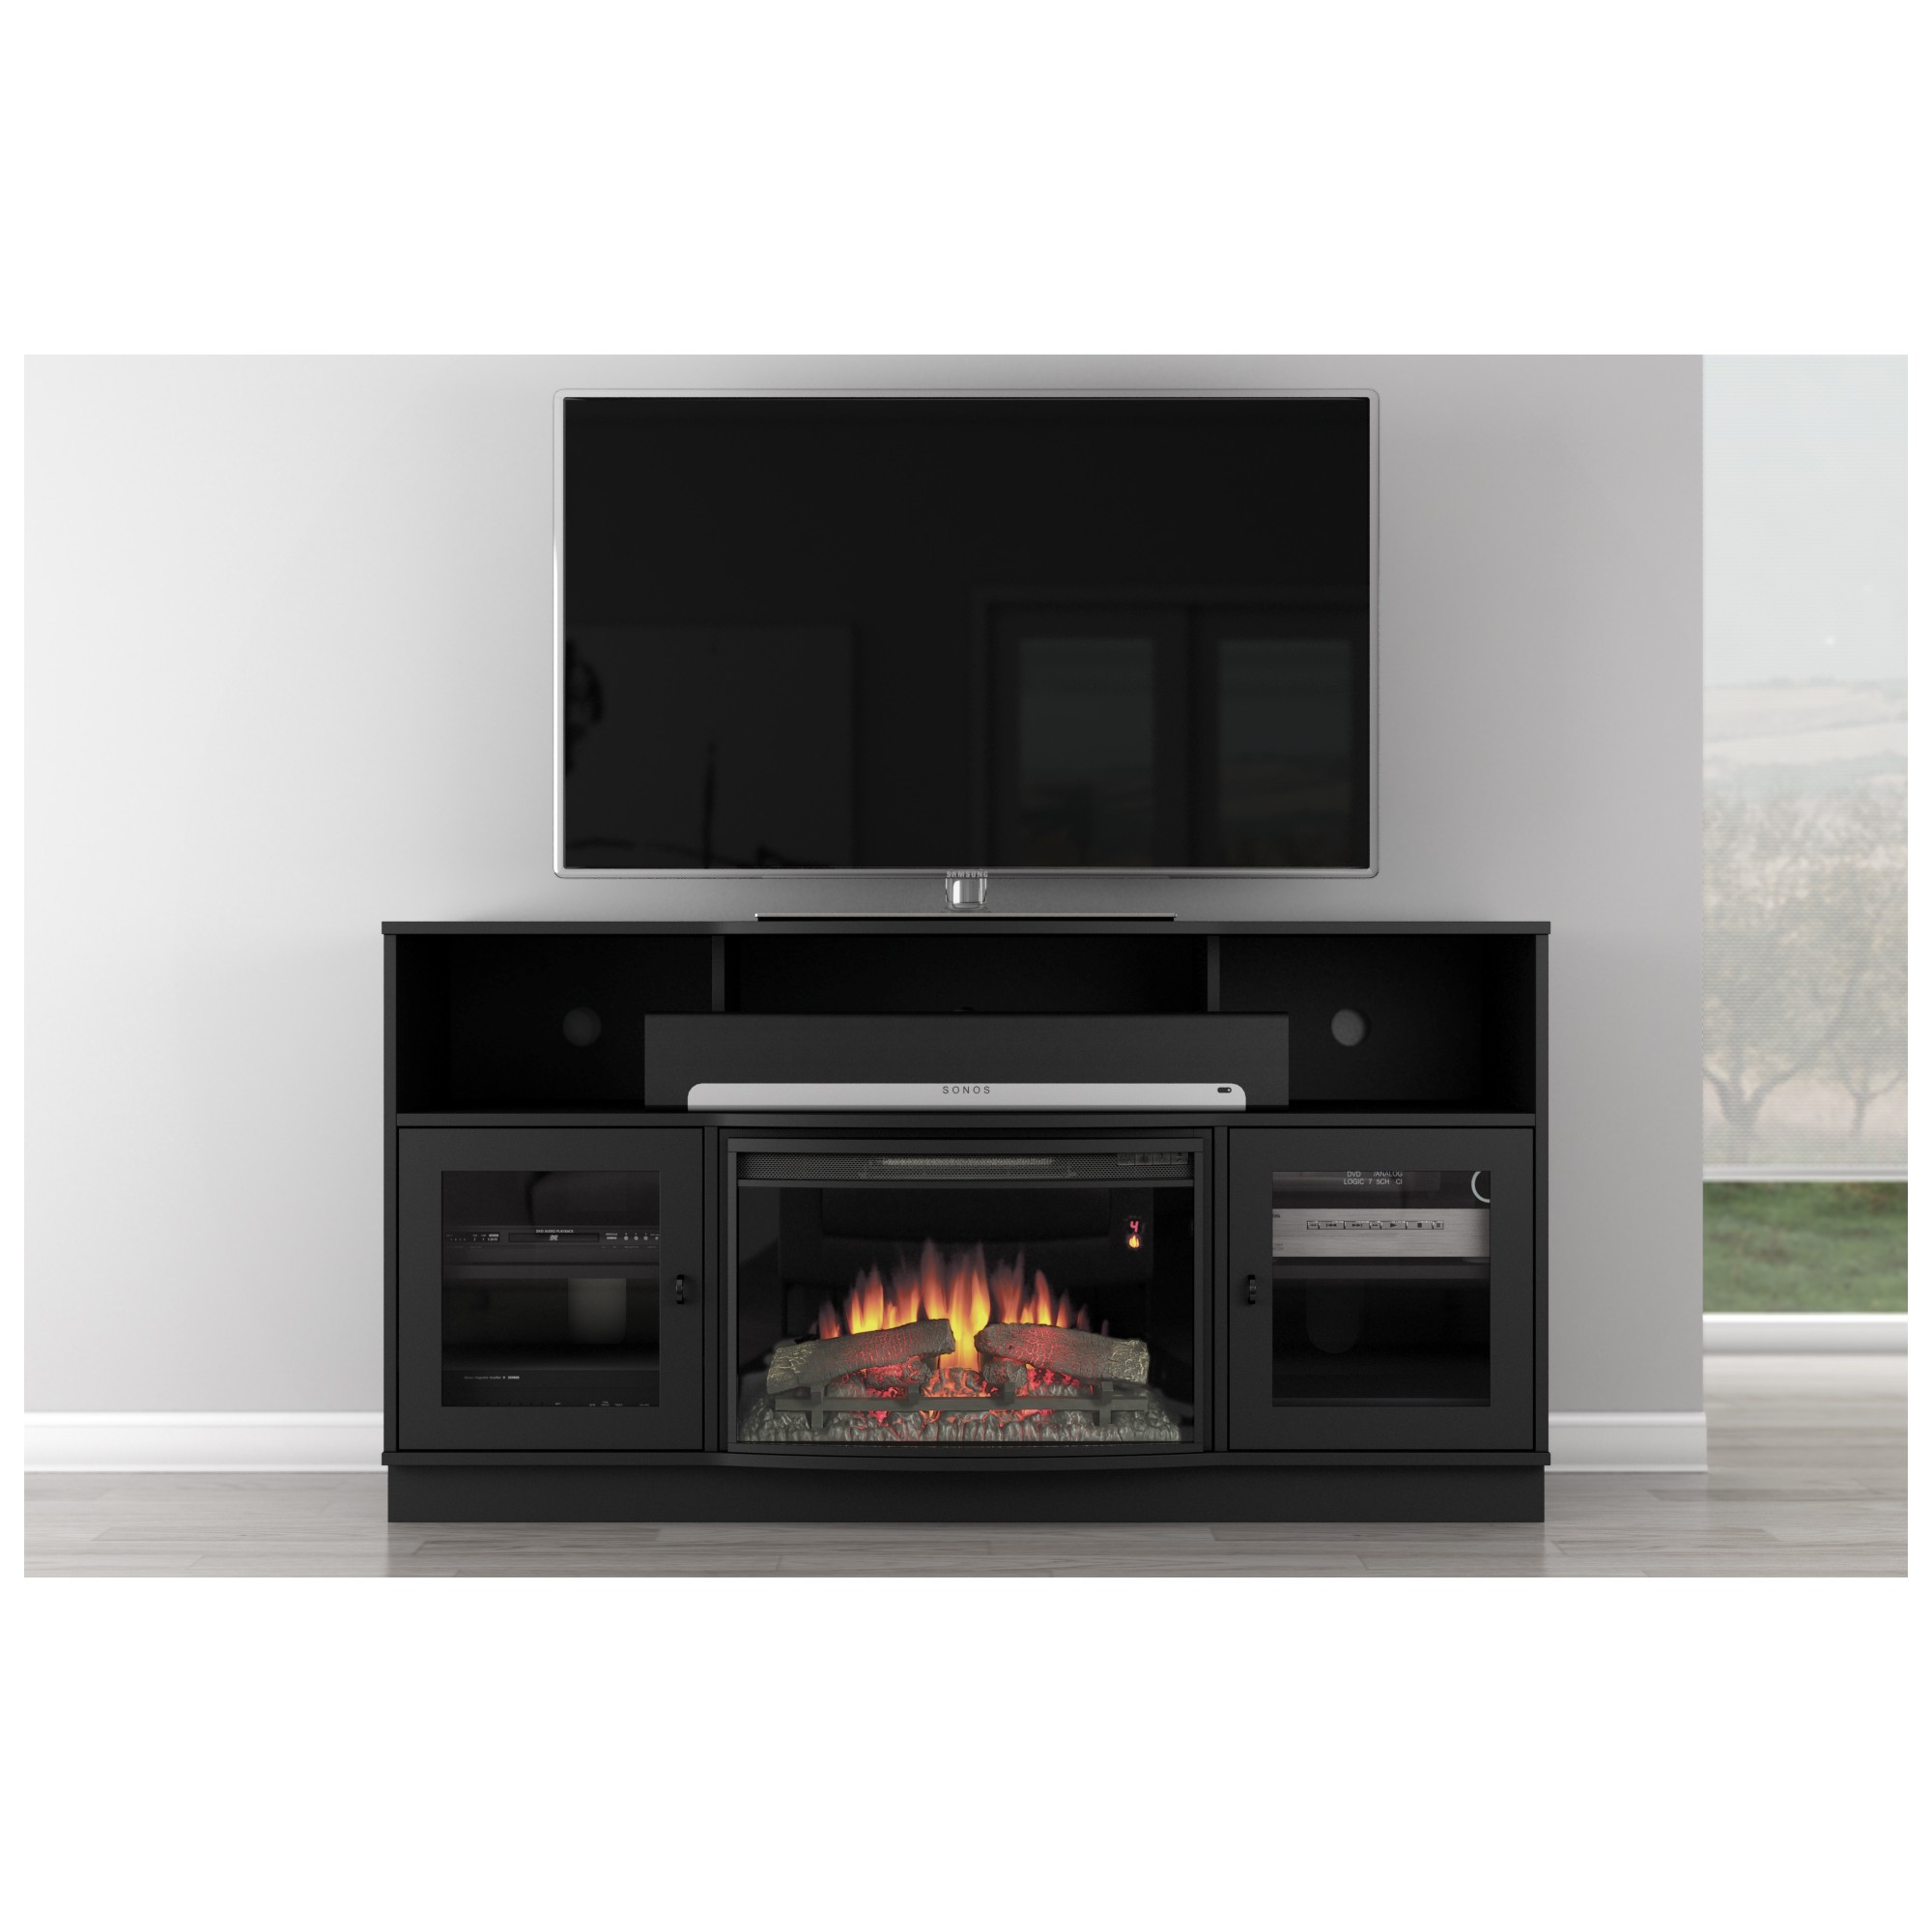 Furnitech FT64CF B FT64CF B 66 TV Stand Contemporary W